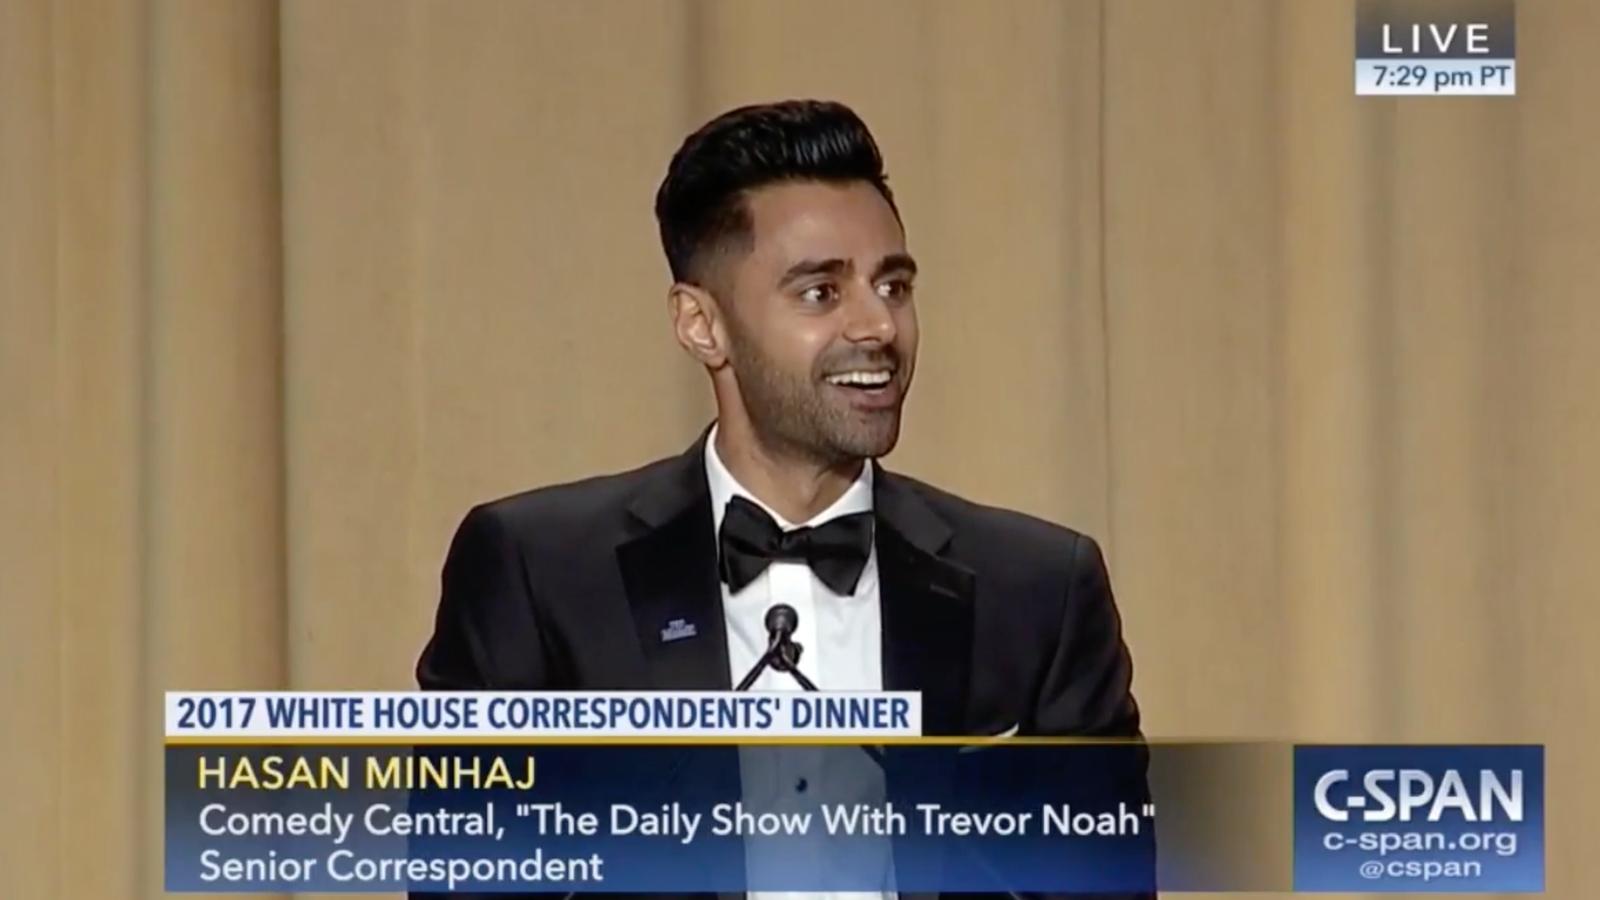 white house correspondents dinner news, video and gossip - jezebel